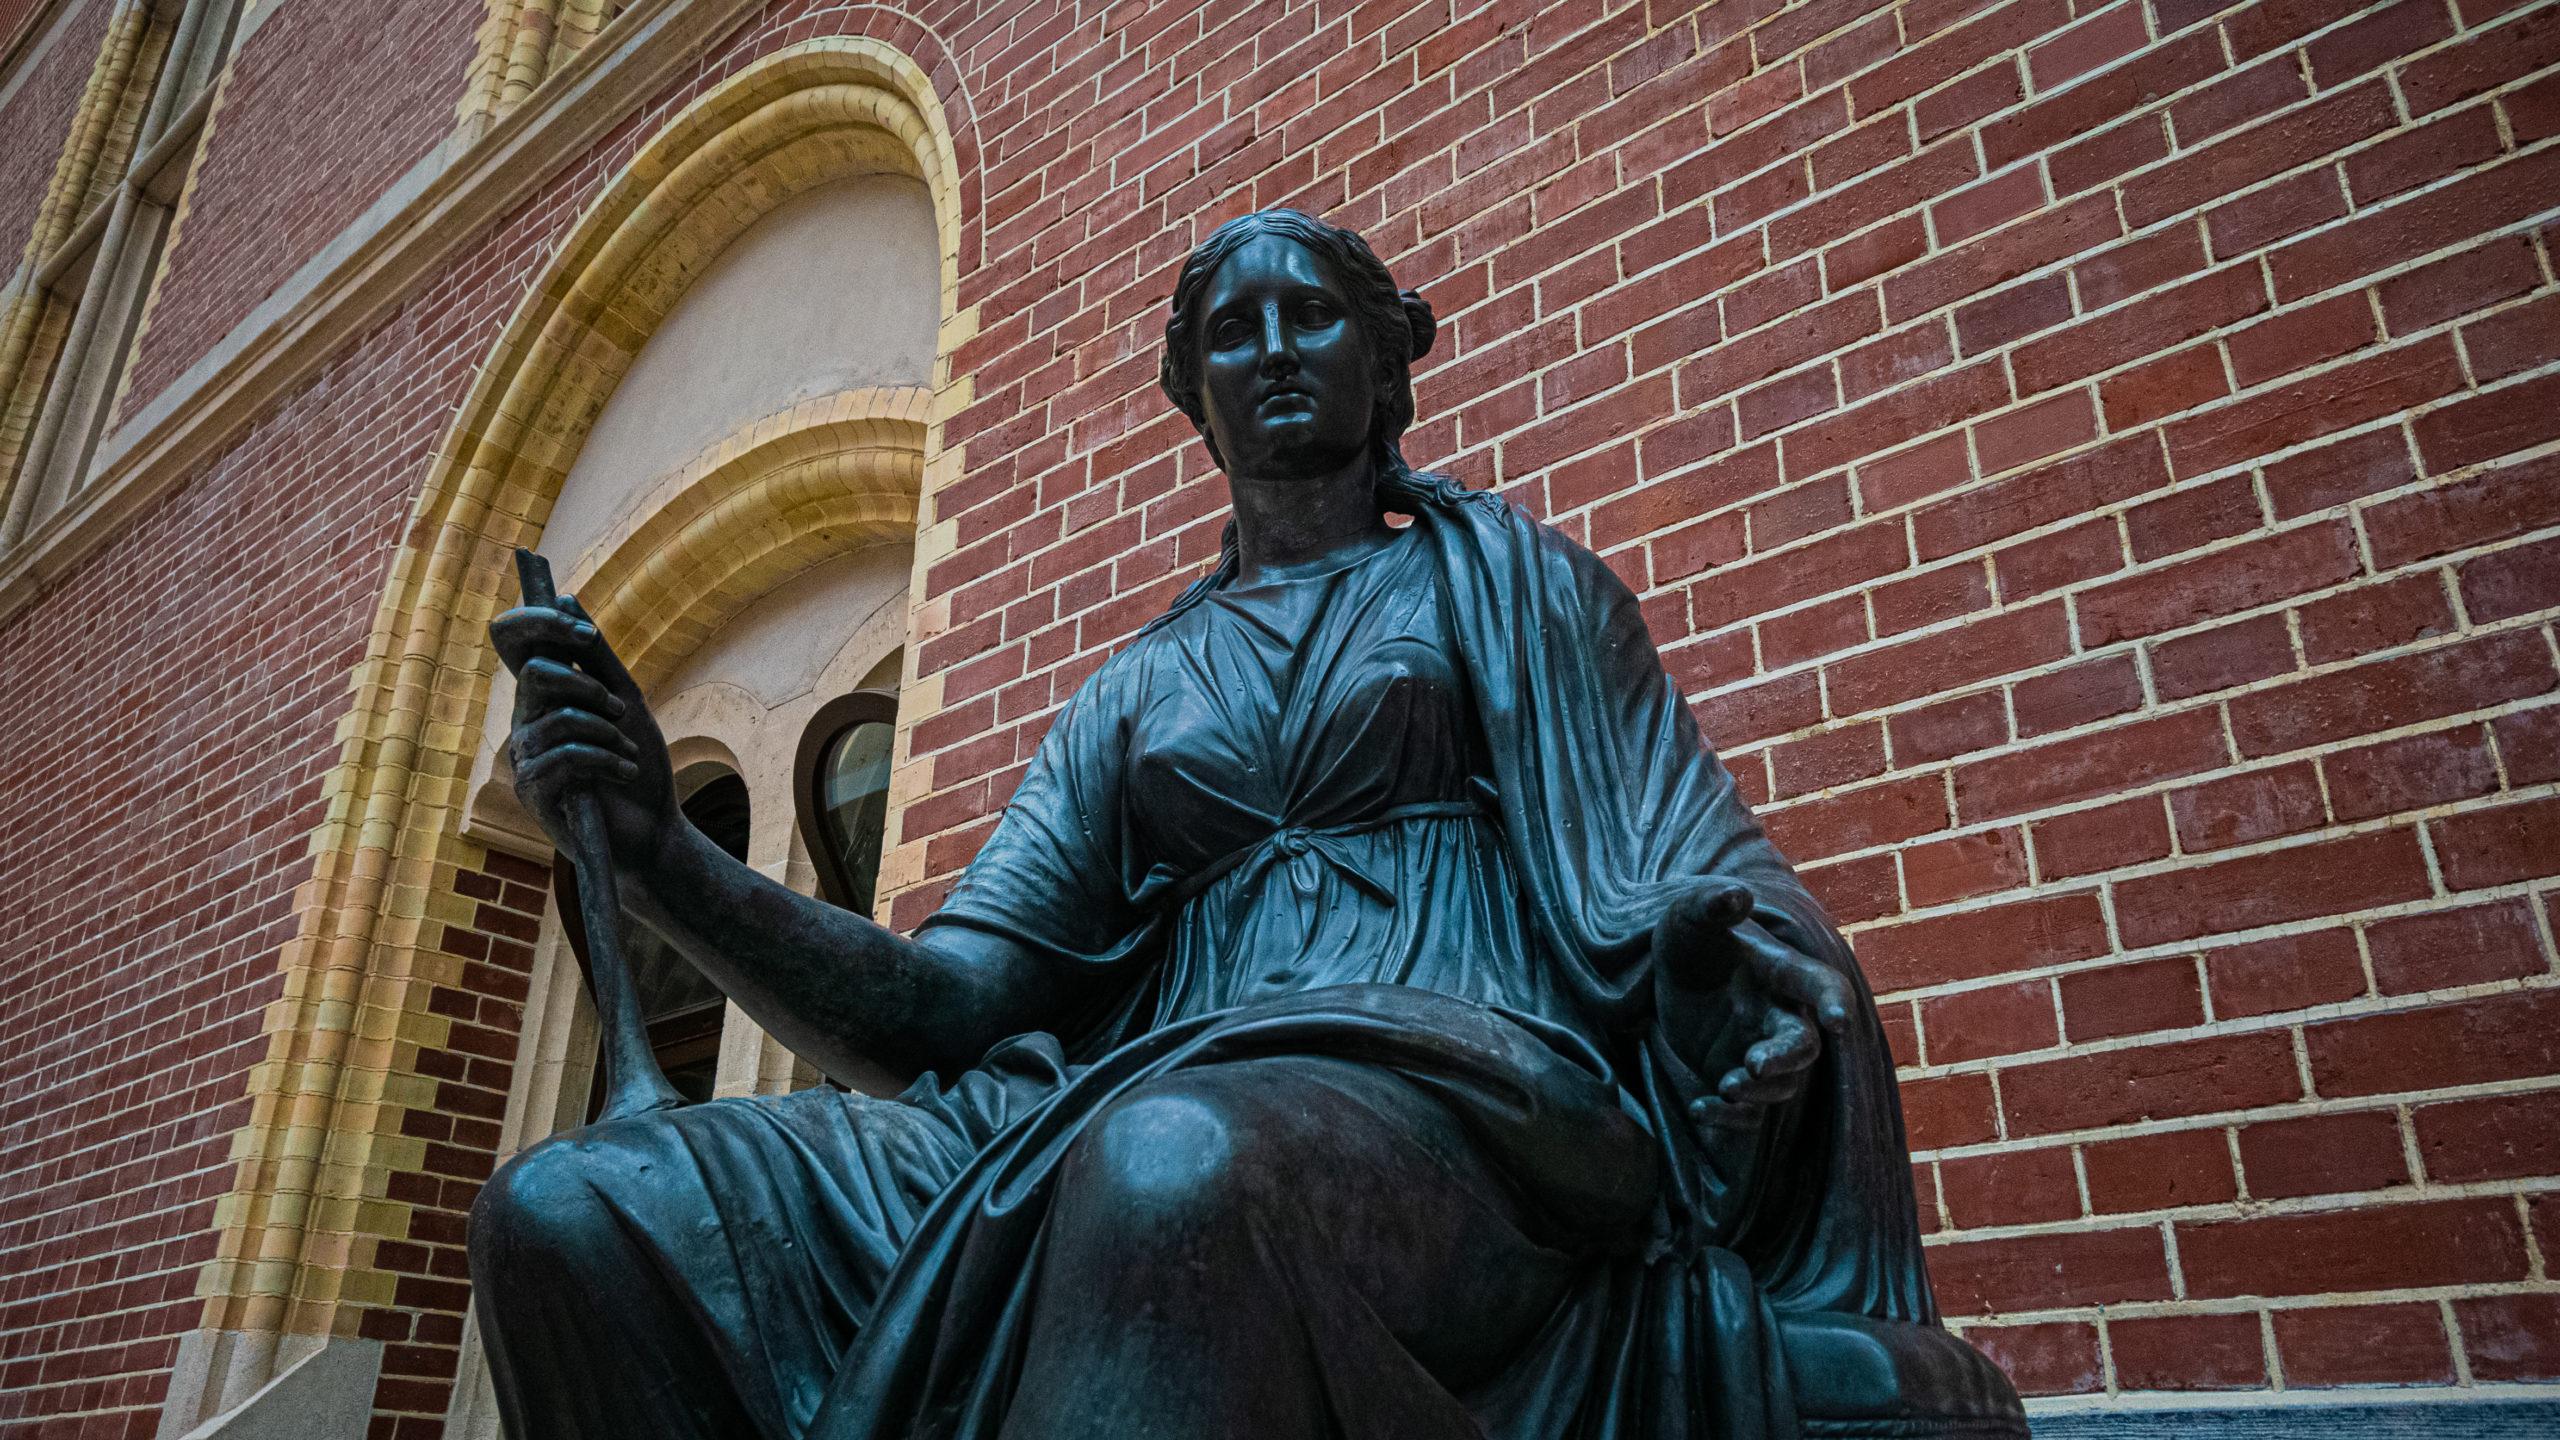 Sculpture de bronze d'un femme issue du hall du Rijskmuseum